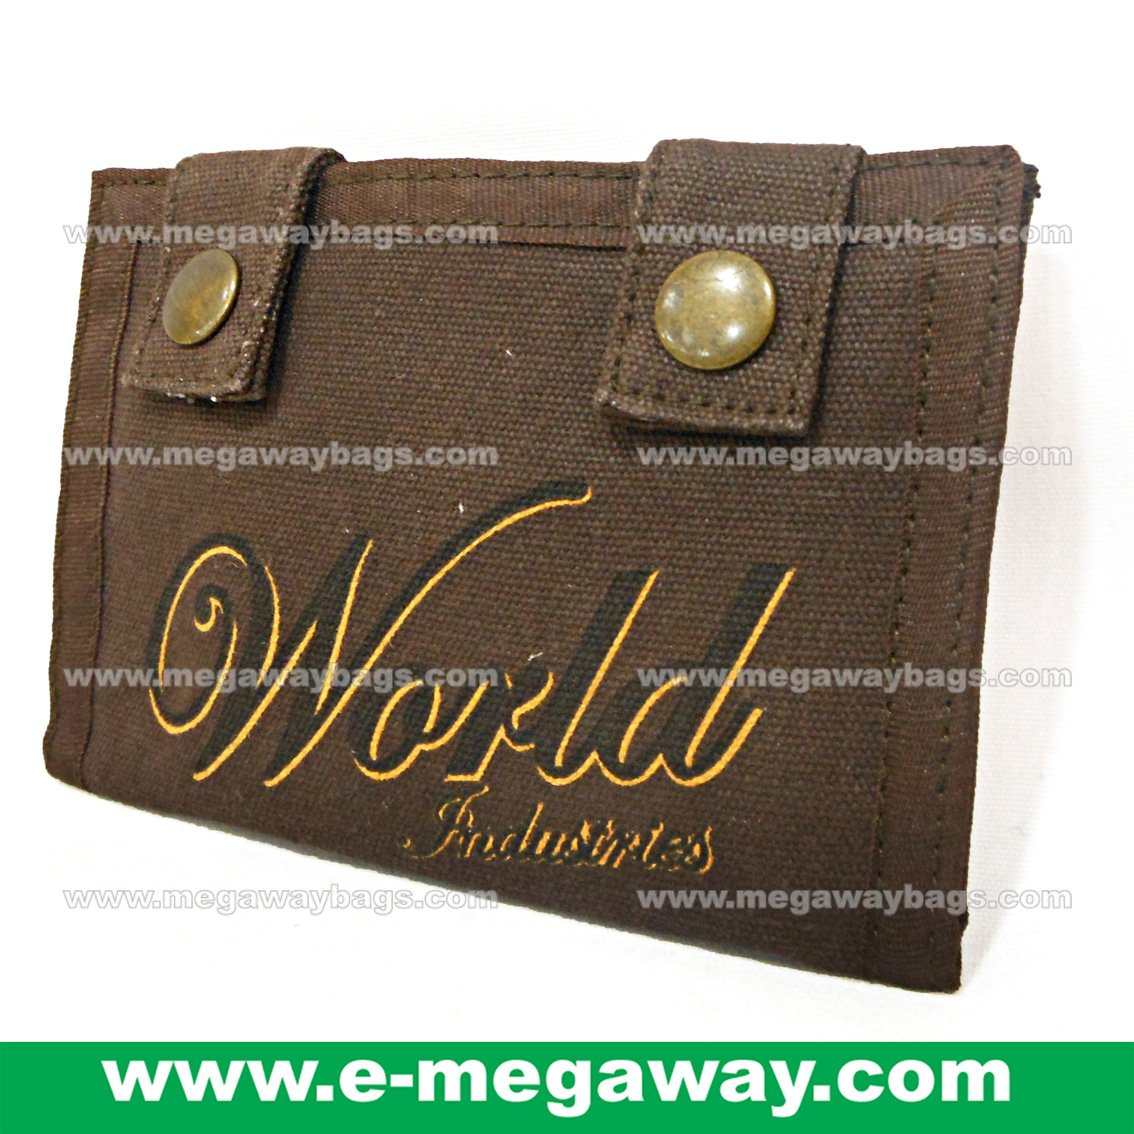 Unisex Purses Wallet w Studs Loop Coins Zip Pouch Bank Cards Money MegawayBags #CC-1058